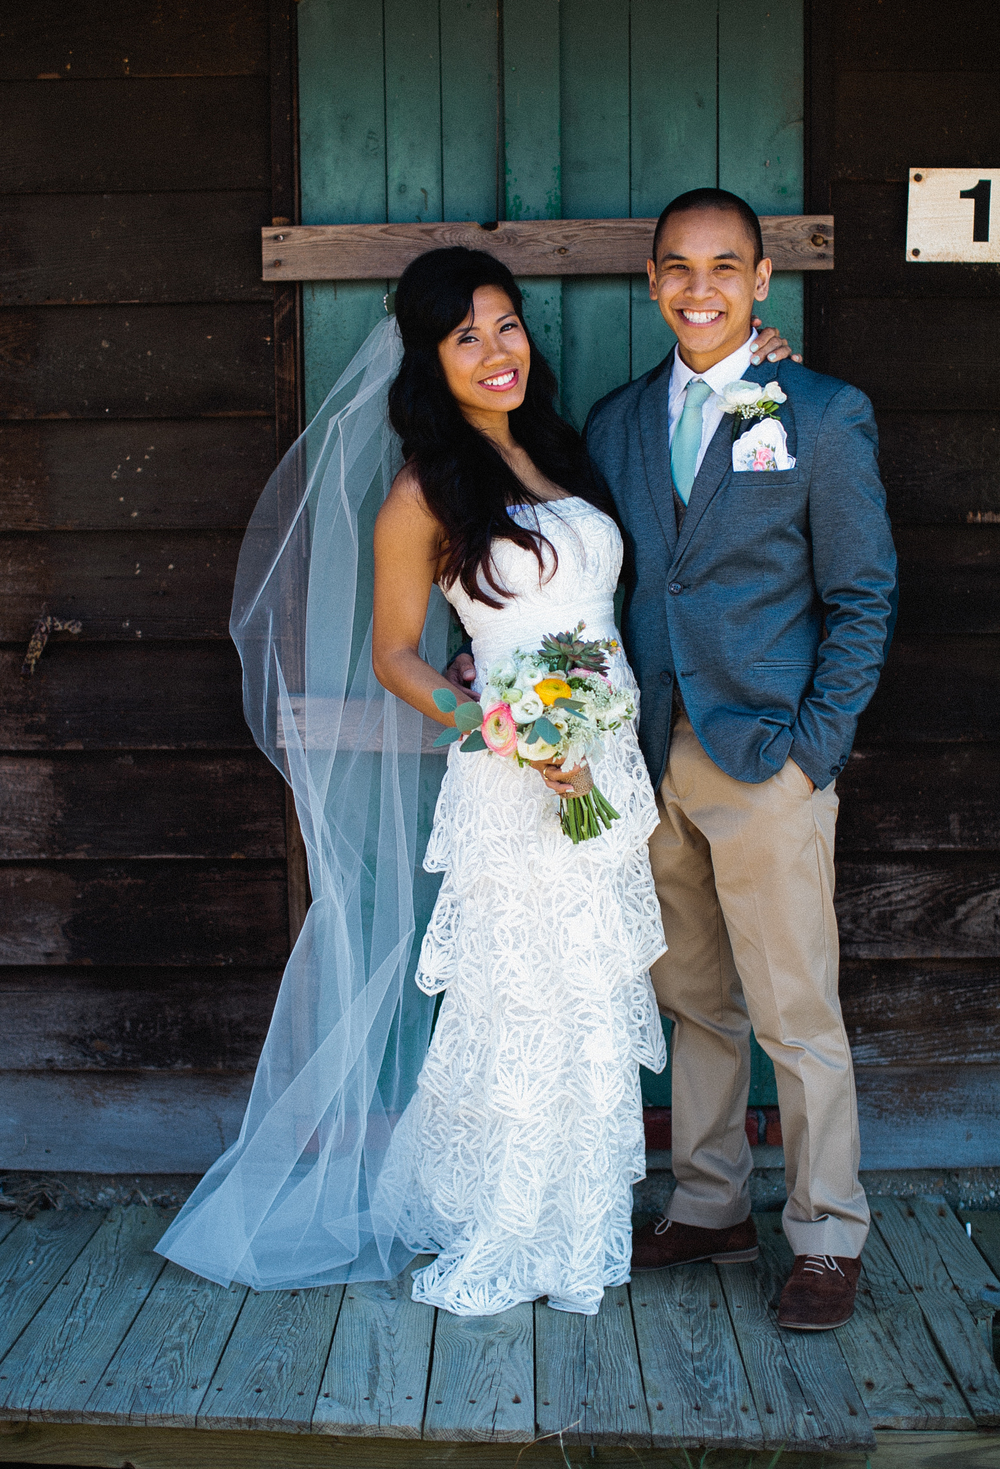 ica_images_tim_wedding_bay_im_kristen_DIY_maryland_photography39of218.jpg~original.jpeg